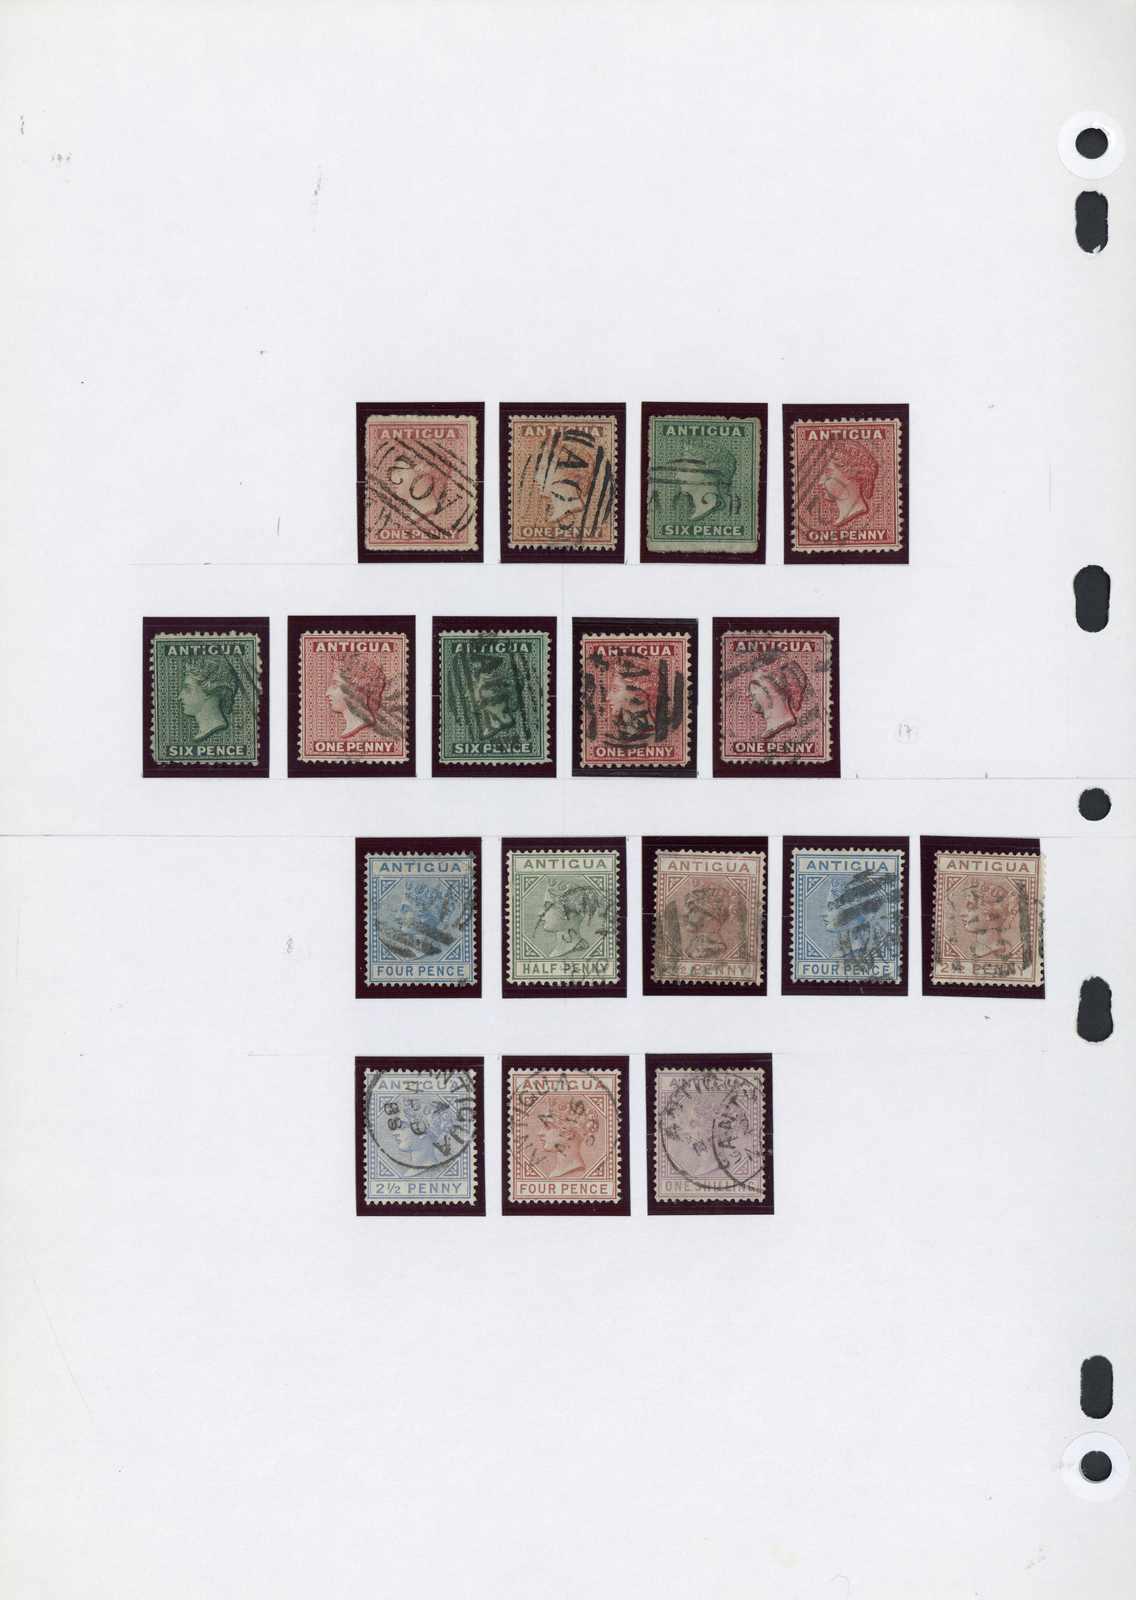 Lot 2730 - COLLECTIONS & ACCUMULATIONS Antigua & Antigua Barbuda -  Auktionshaus Schlegel 26 Public Auction